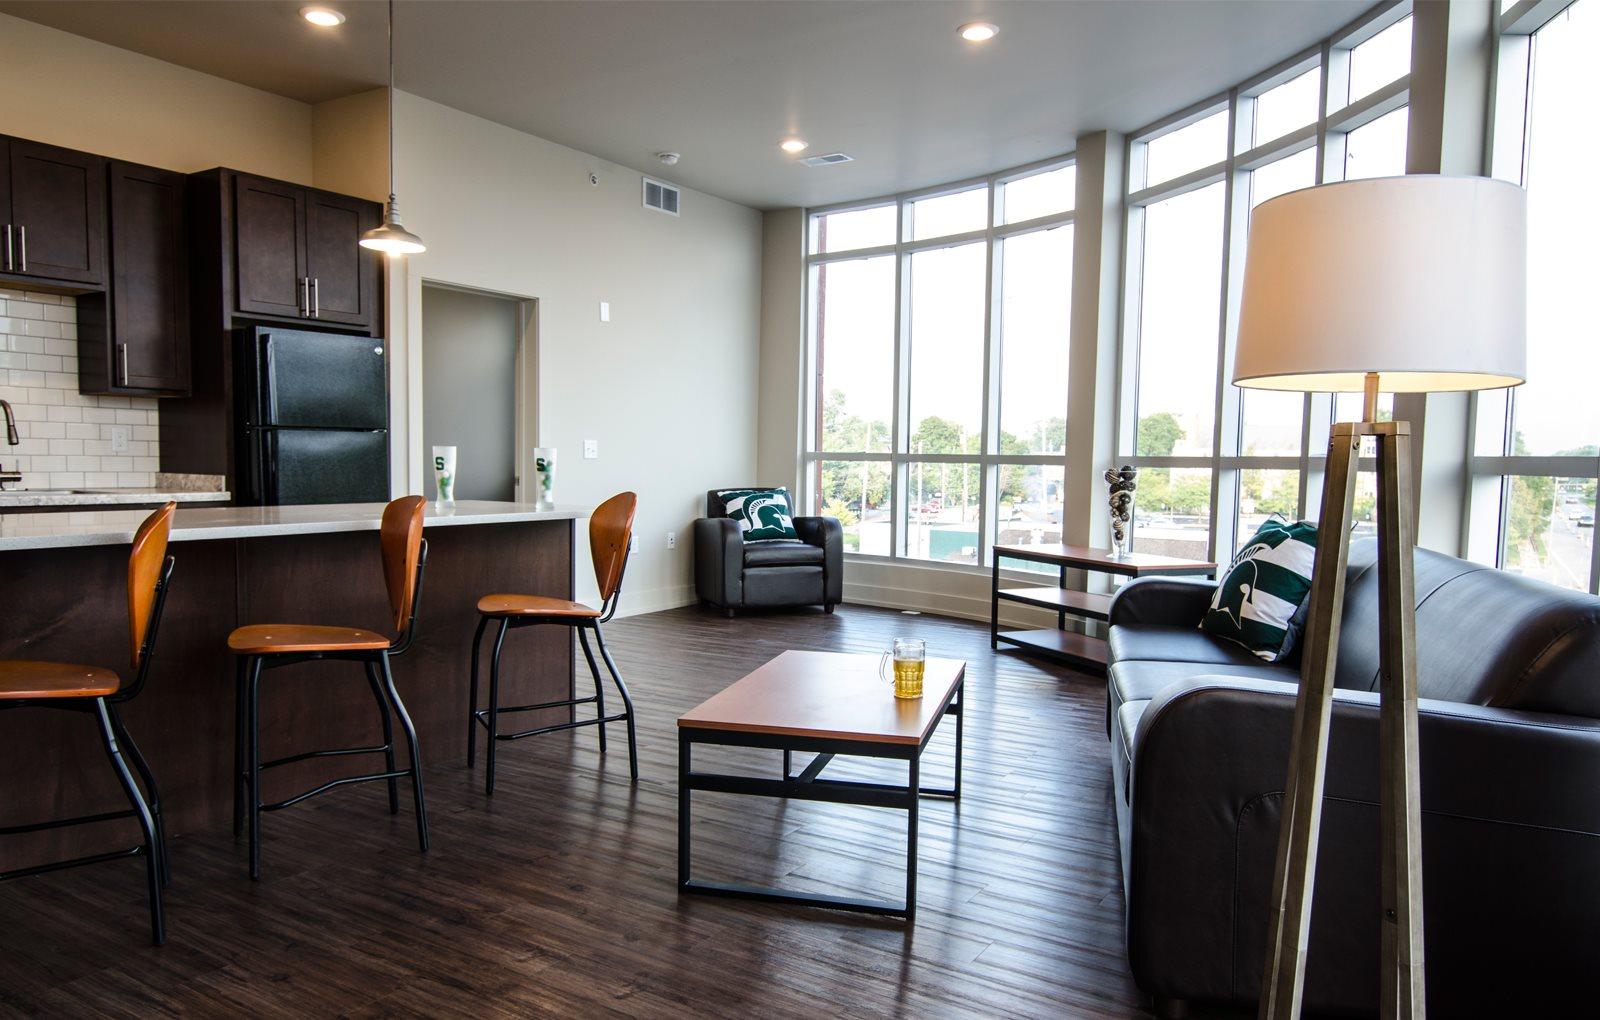 dtn east lansing apartments for rent grand rapids holt dewitt